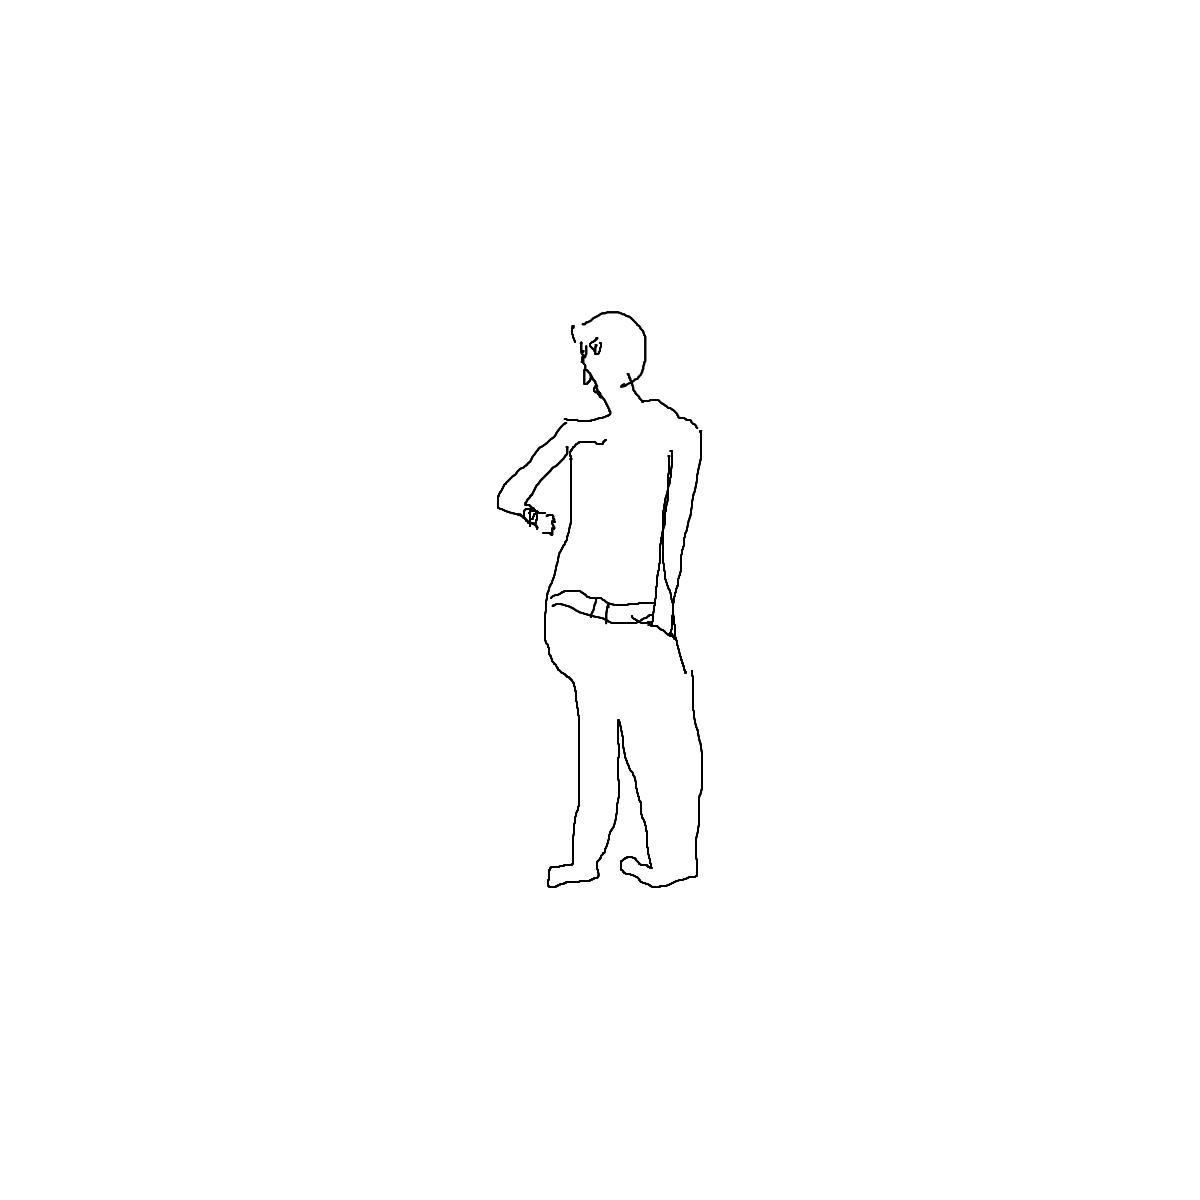 BAAAM drawing#16337 lat:52.4697647094726560lng: 13.4240865707397460